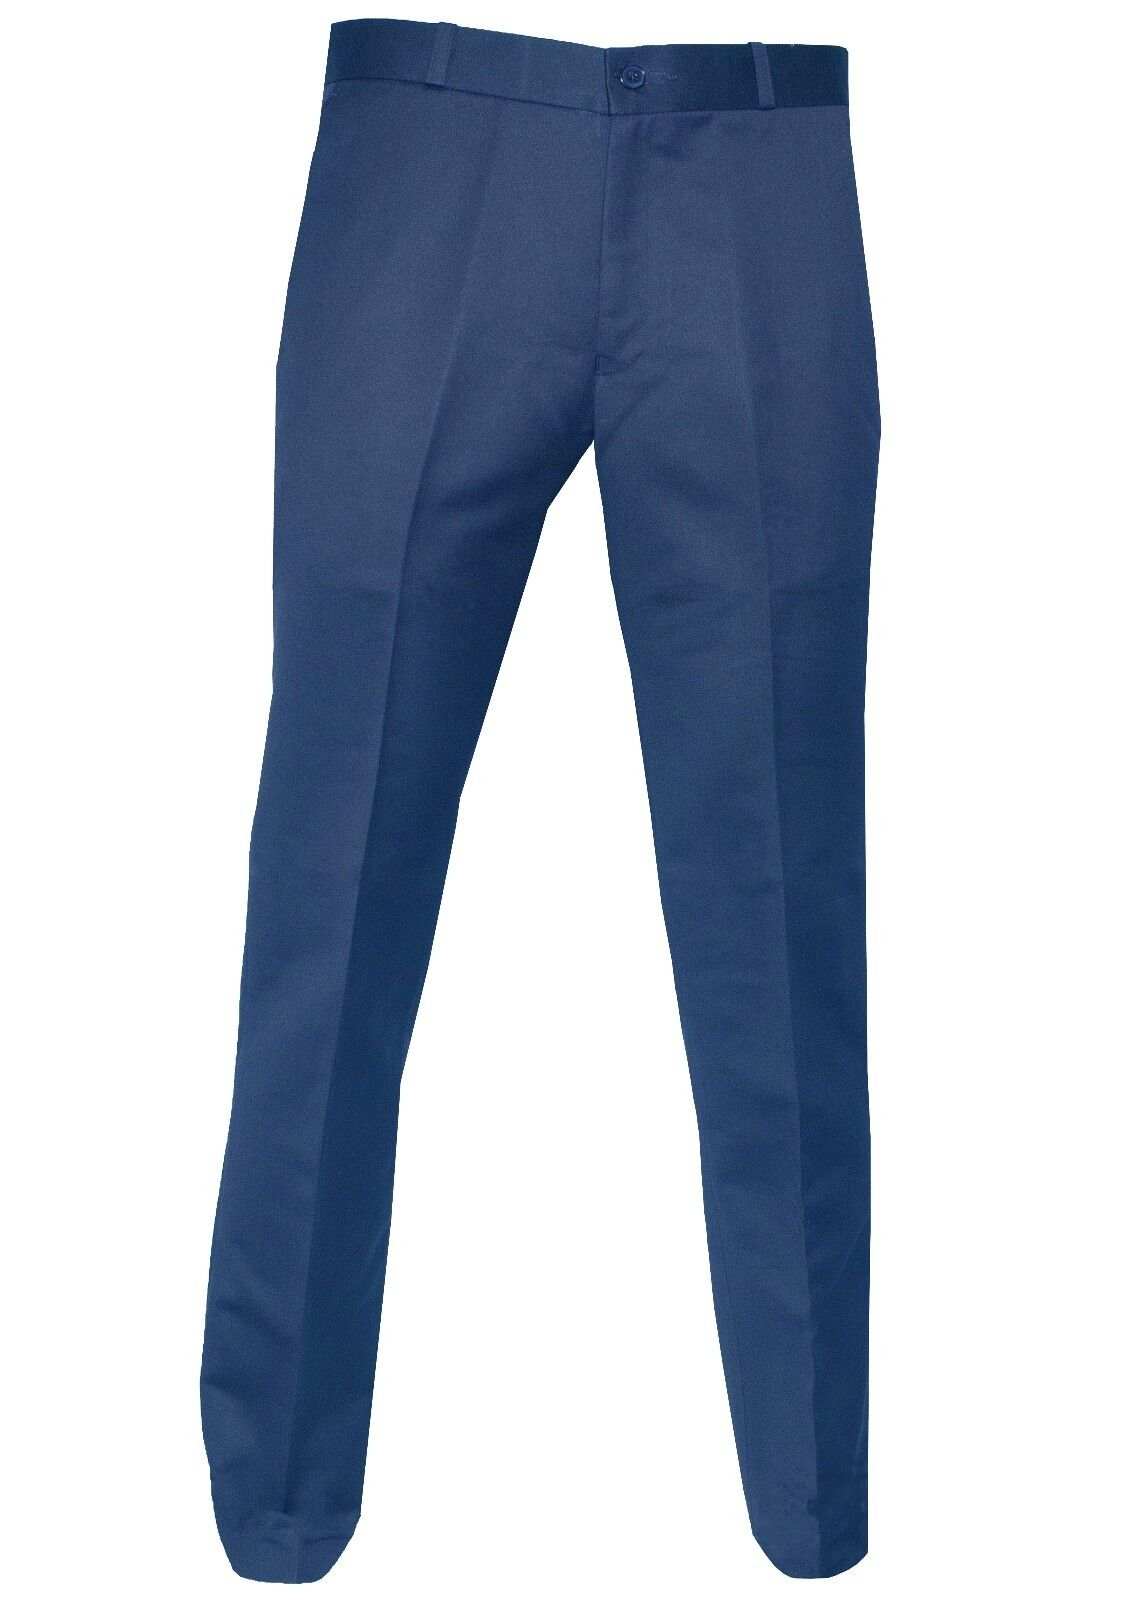 Uomo Relco Blu Tonico Sta Stampa Pantaloni Due Tonalità Skinhead Mods Tg 32 a 42